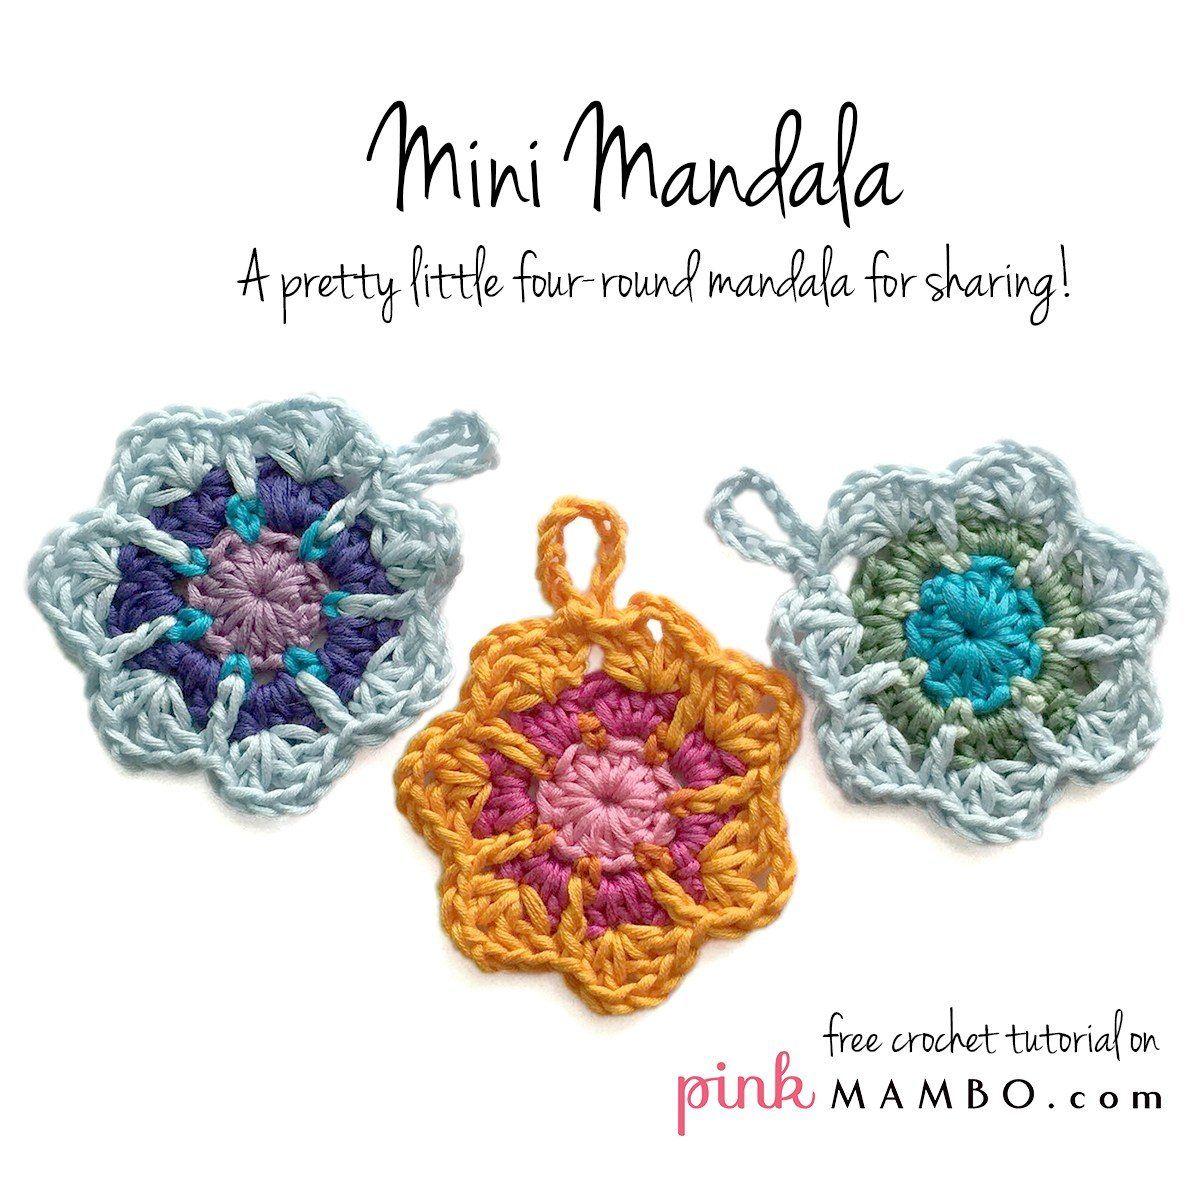 Gzhel Mini Mandala Free Crochet Pattern + Many Mini Crochet Mandalas ...